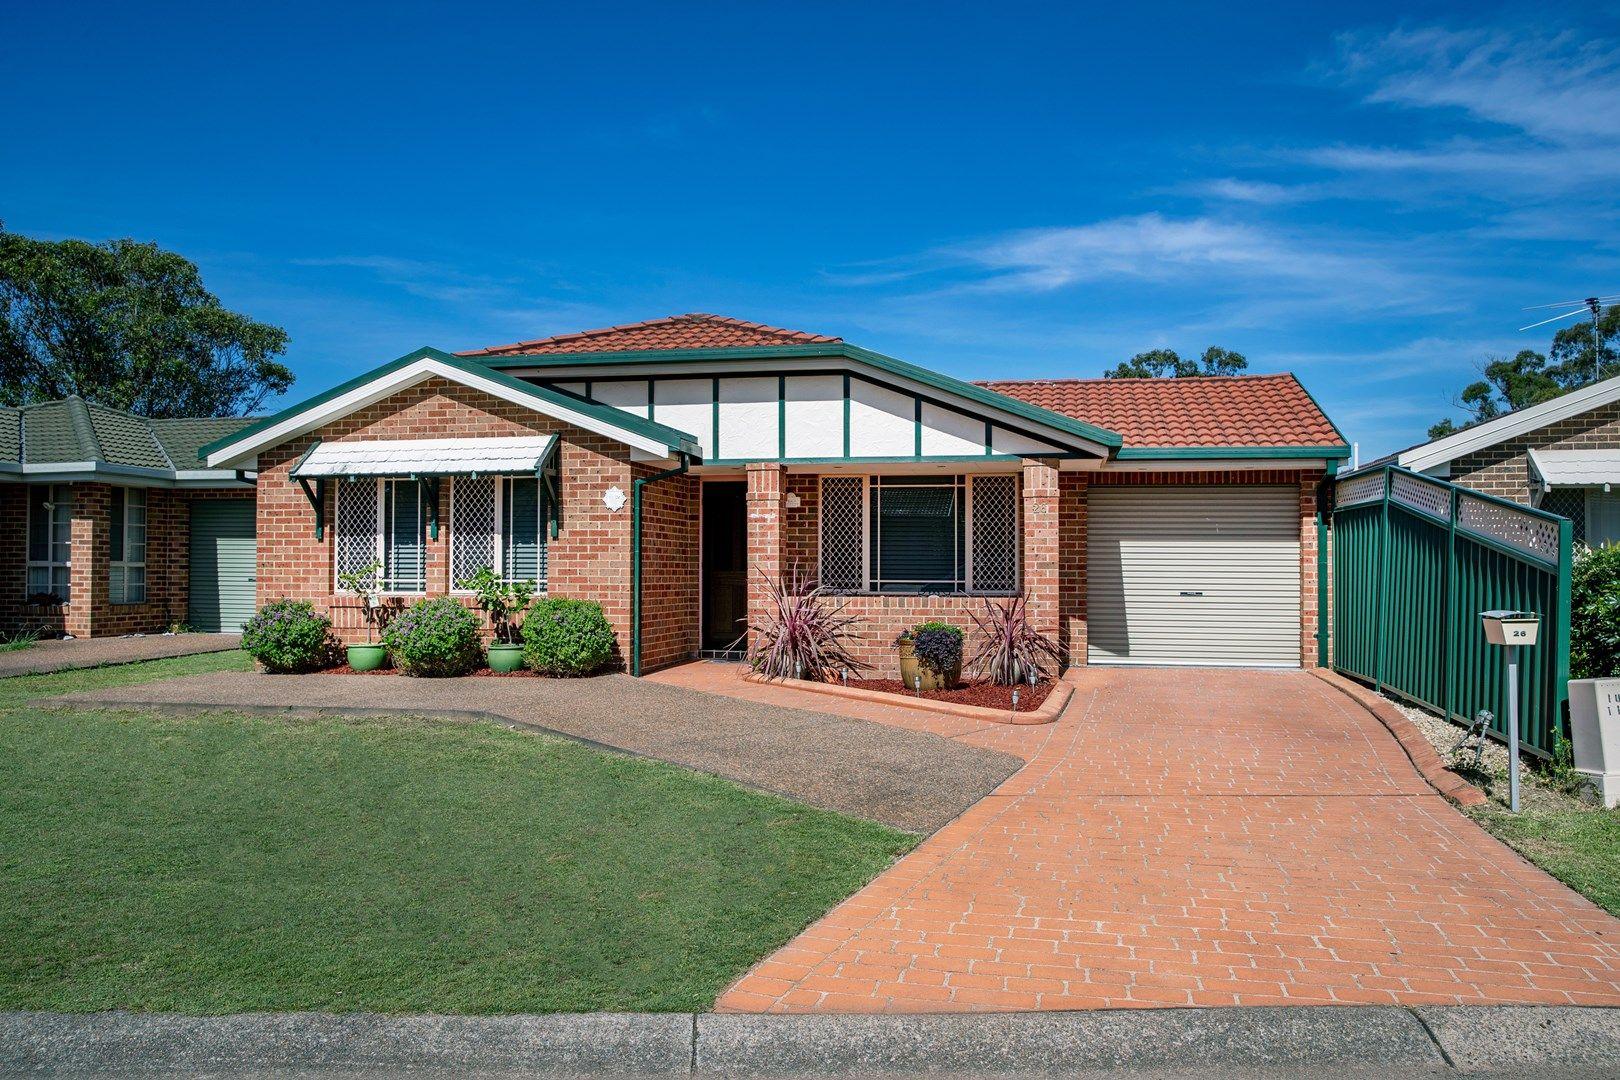 26 John Howe Close, Glendale NSW 2285, Image 0